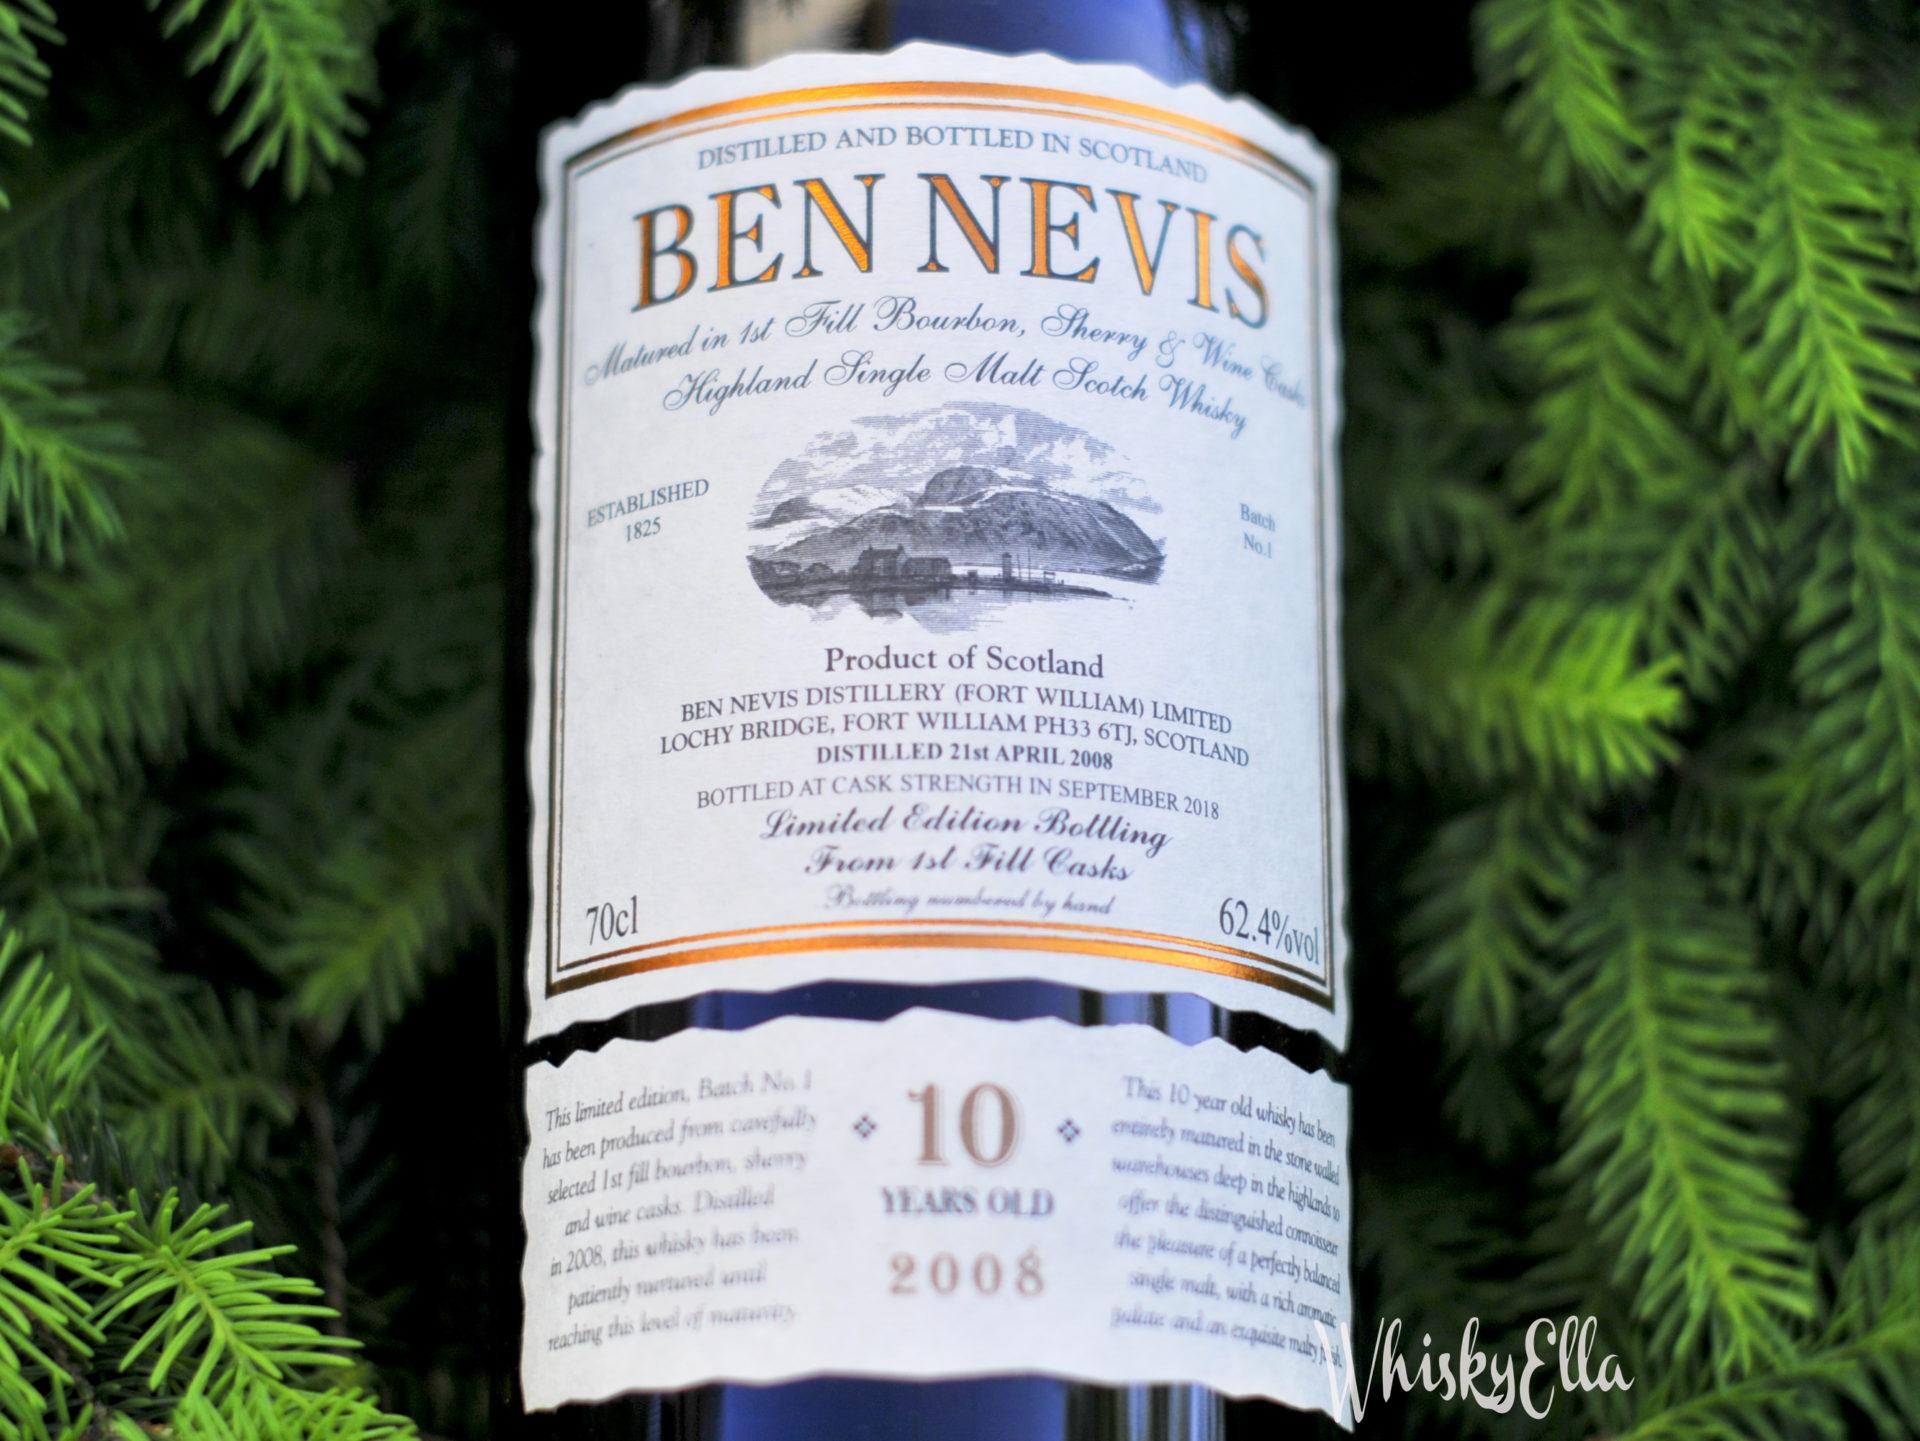 Nasza recenzja Ben Nevis 10 yo Batch No. 1 Limited Edition Vintage 2008 #27